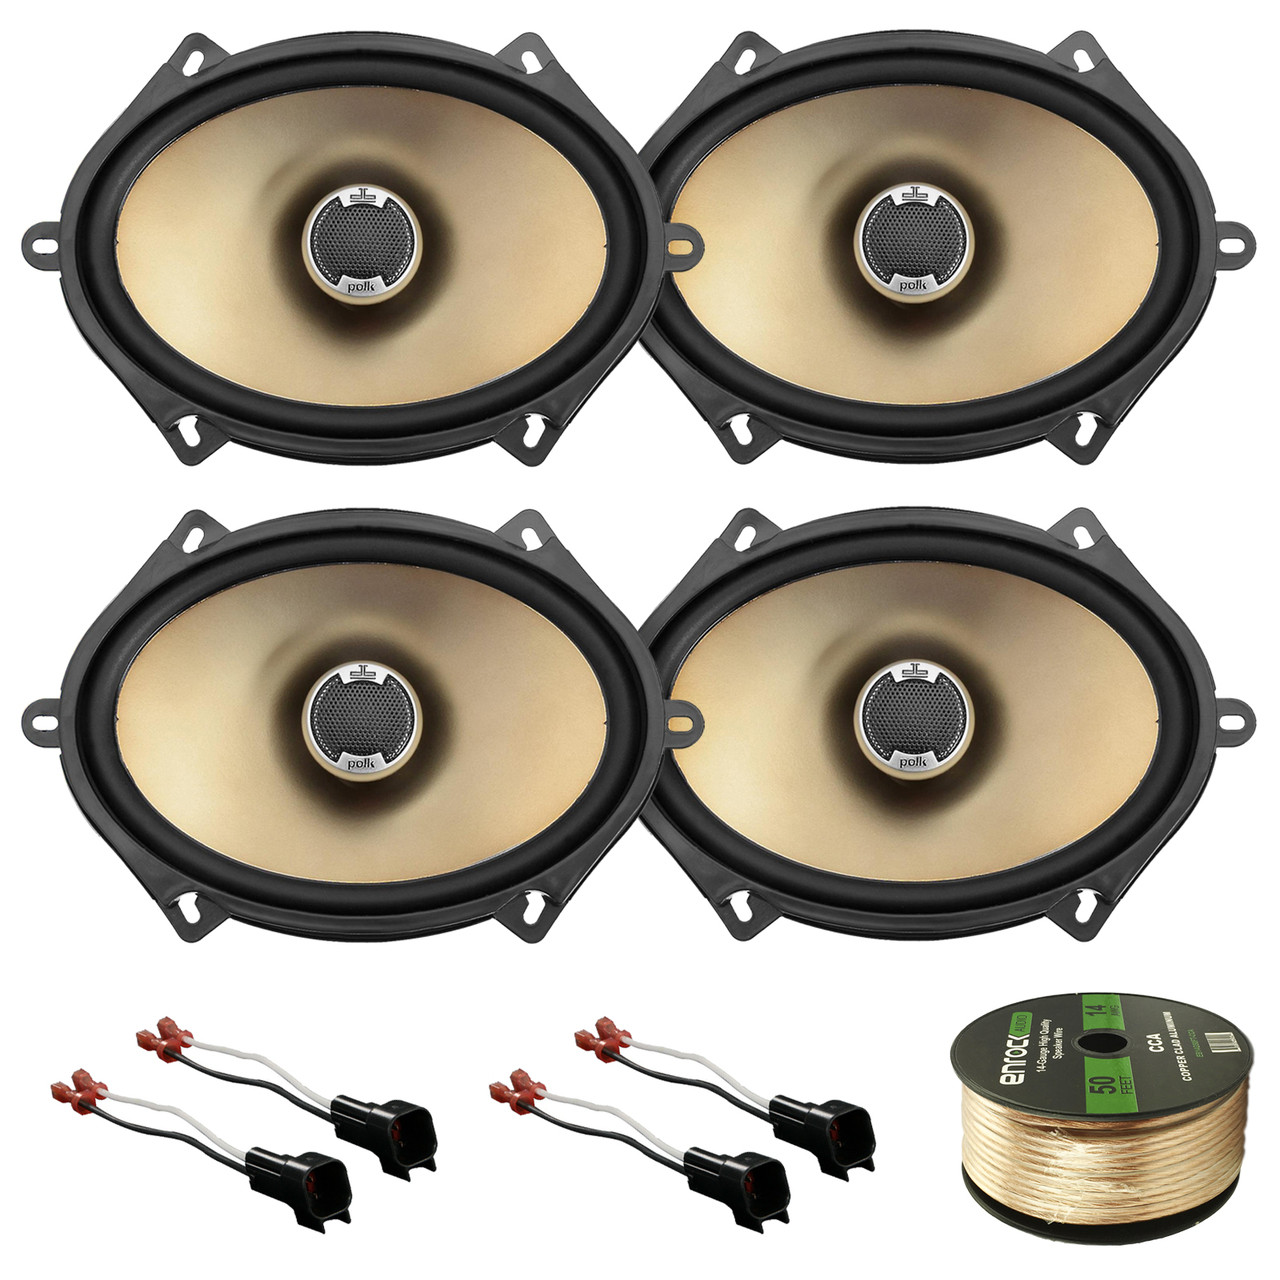 enrock 14 awg gauge 50 feet speaker wire 2 x db571 x new pair polk audio car audio 5 x 7 2 way car audio speakers 180 watts max  [ 1280 x 1280 Pixel ]